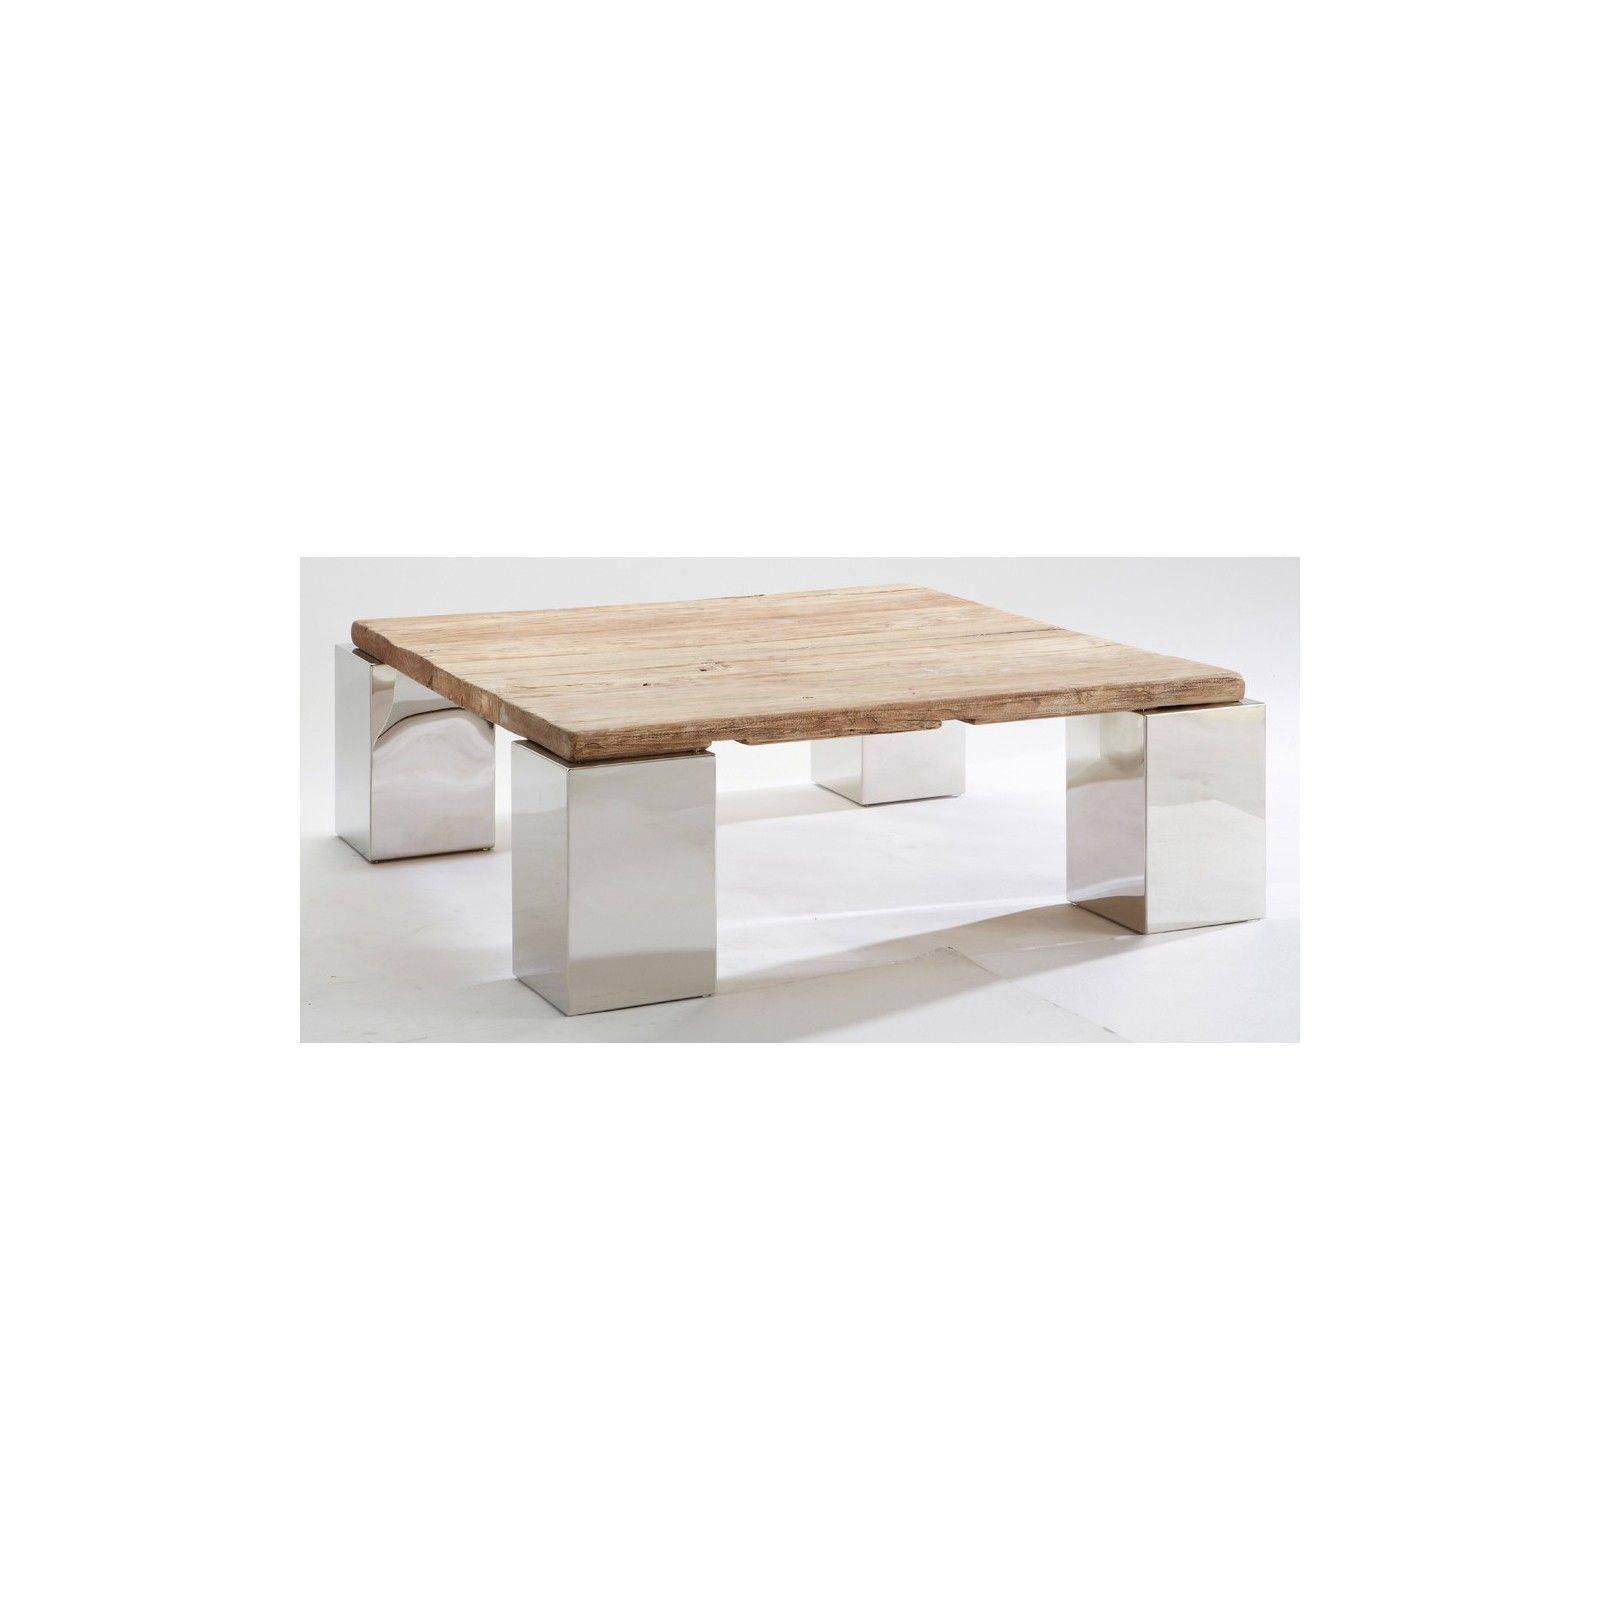 Table basse carrée en orme Stainless ethnique chic 100cm